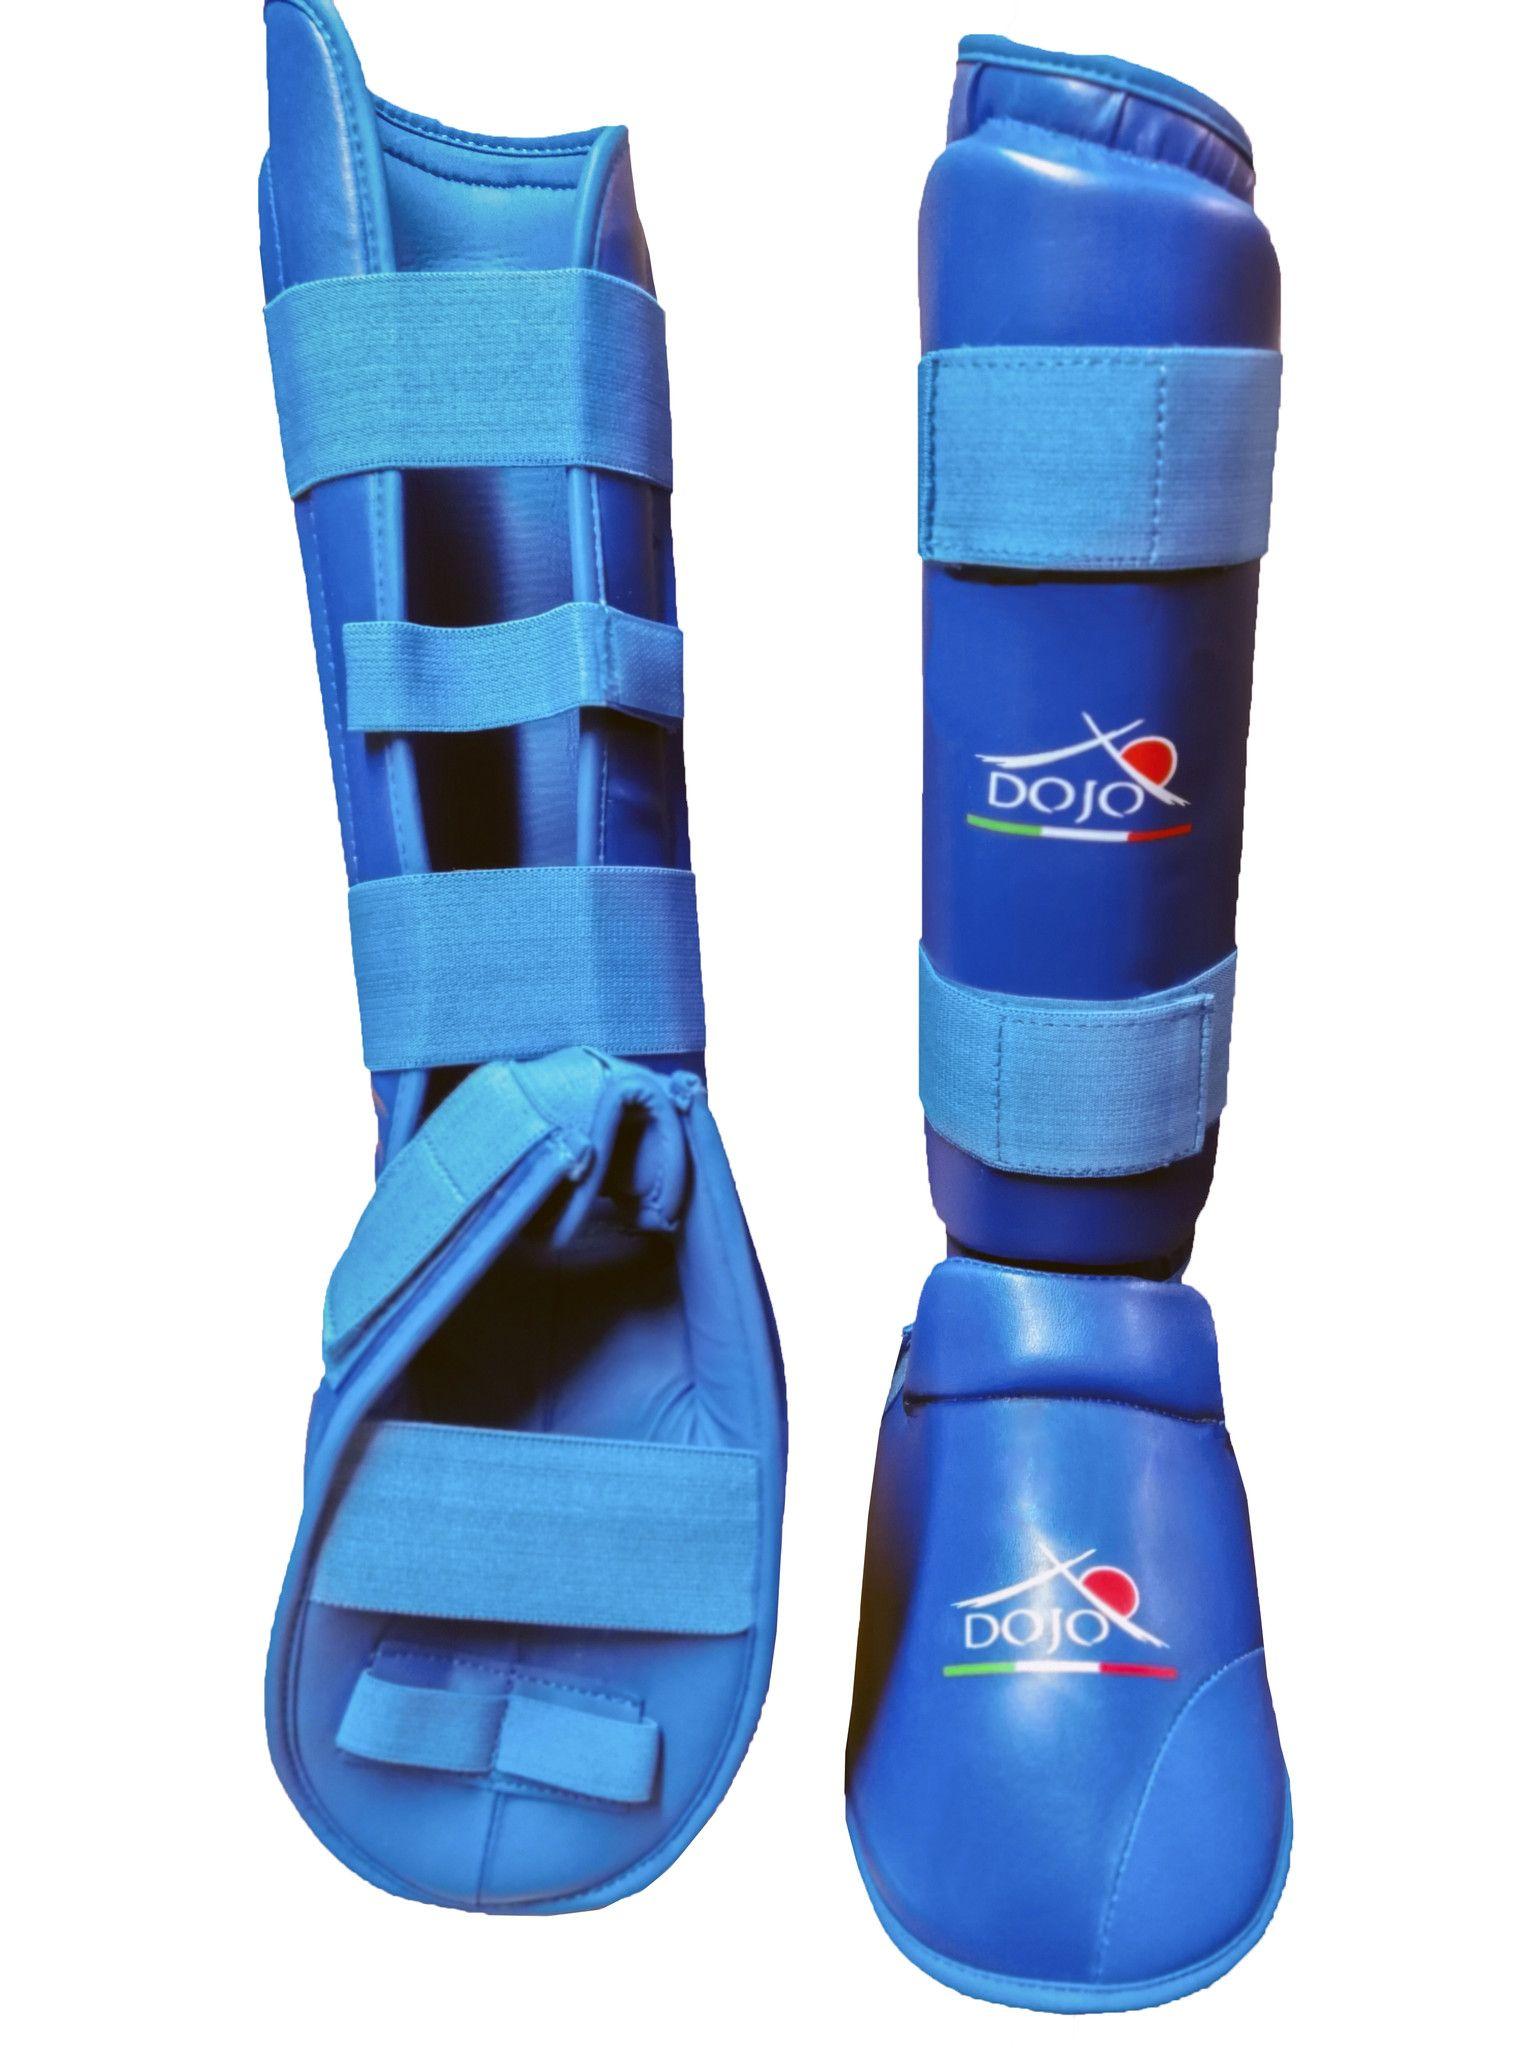 Dojo - Paratibia per Karate con piede Blu Training